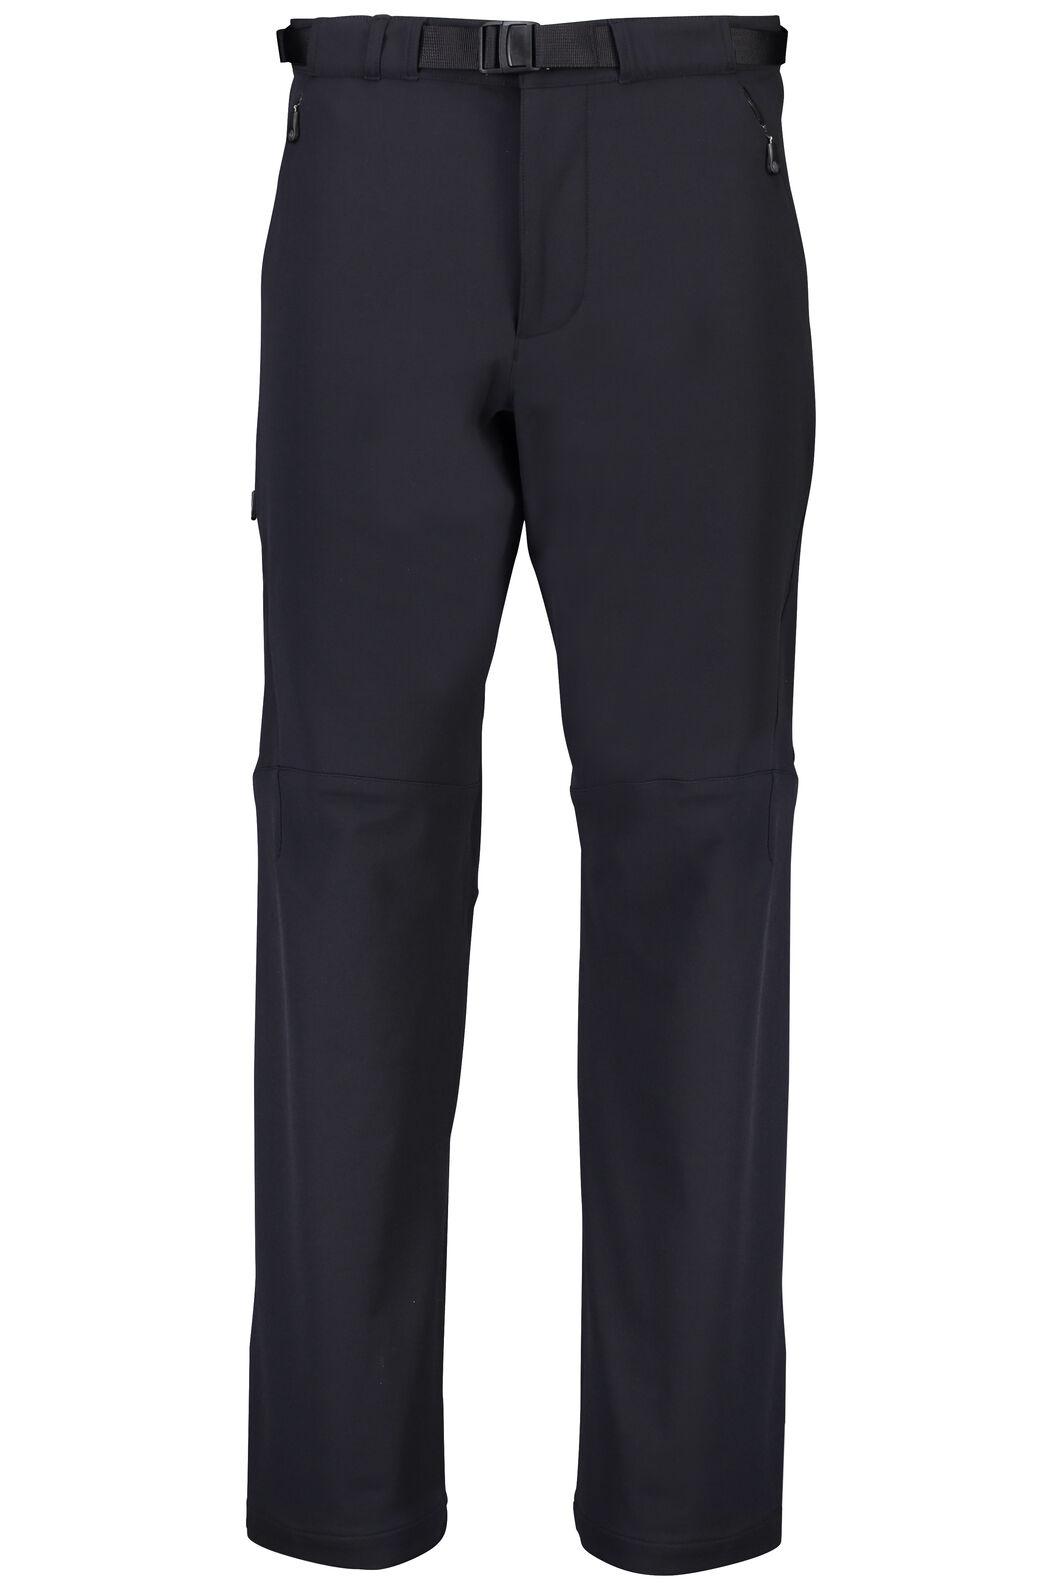 Macpac Nemesis Softshell Pants — Men's, Black, hi-res